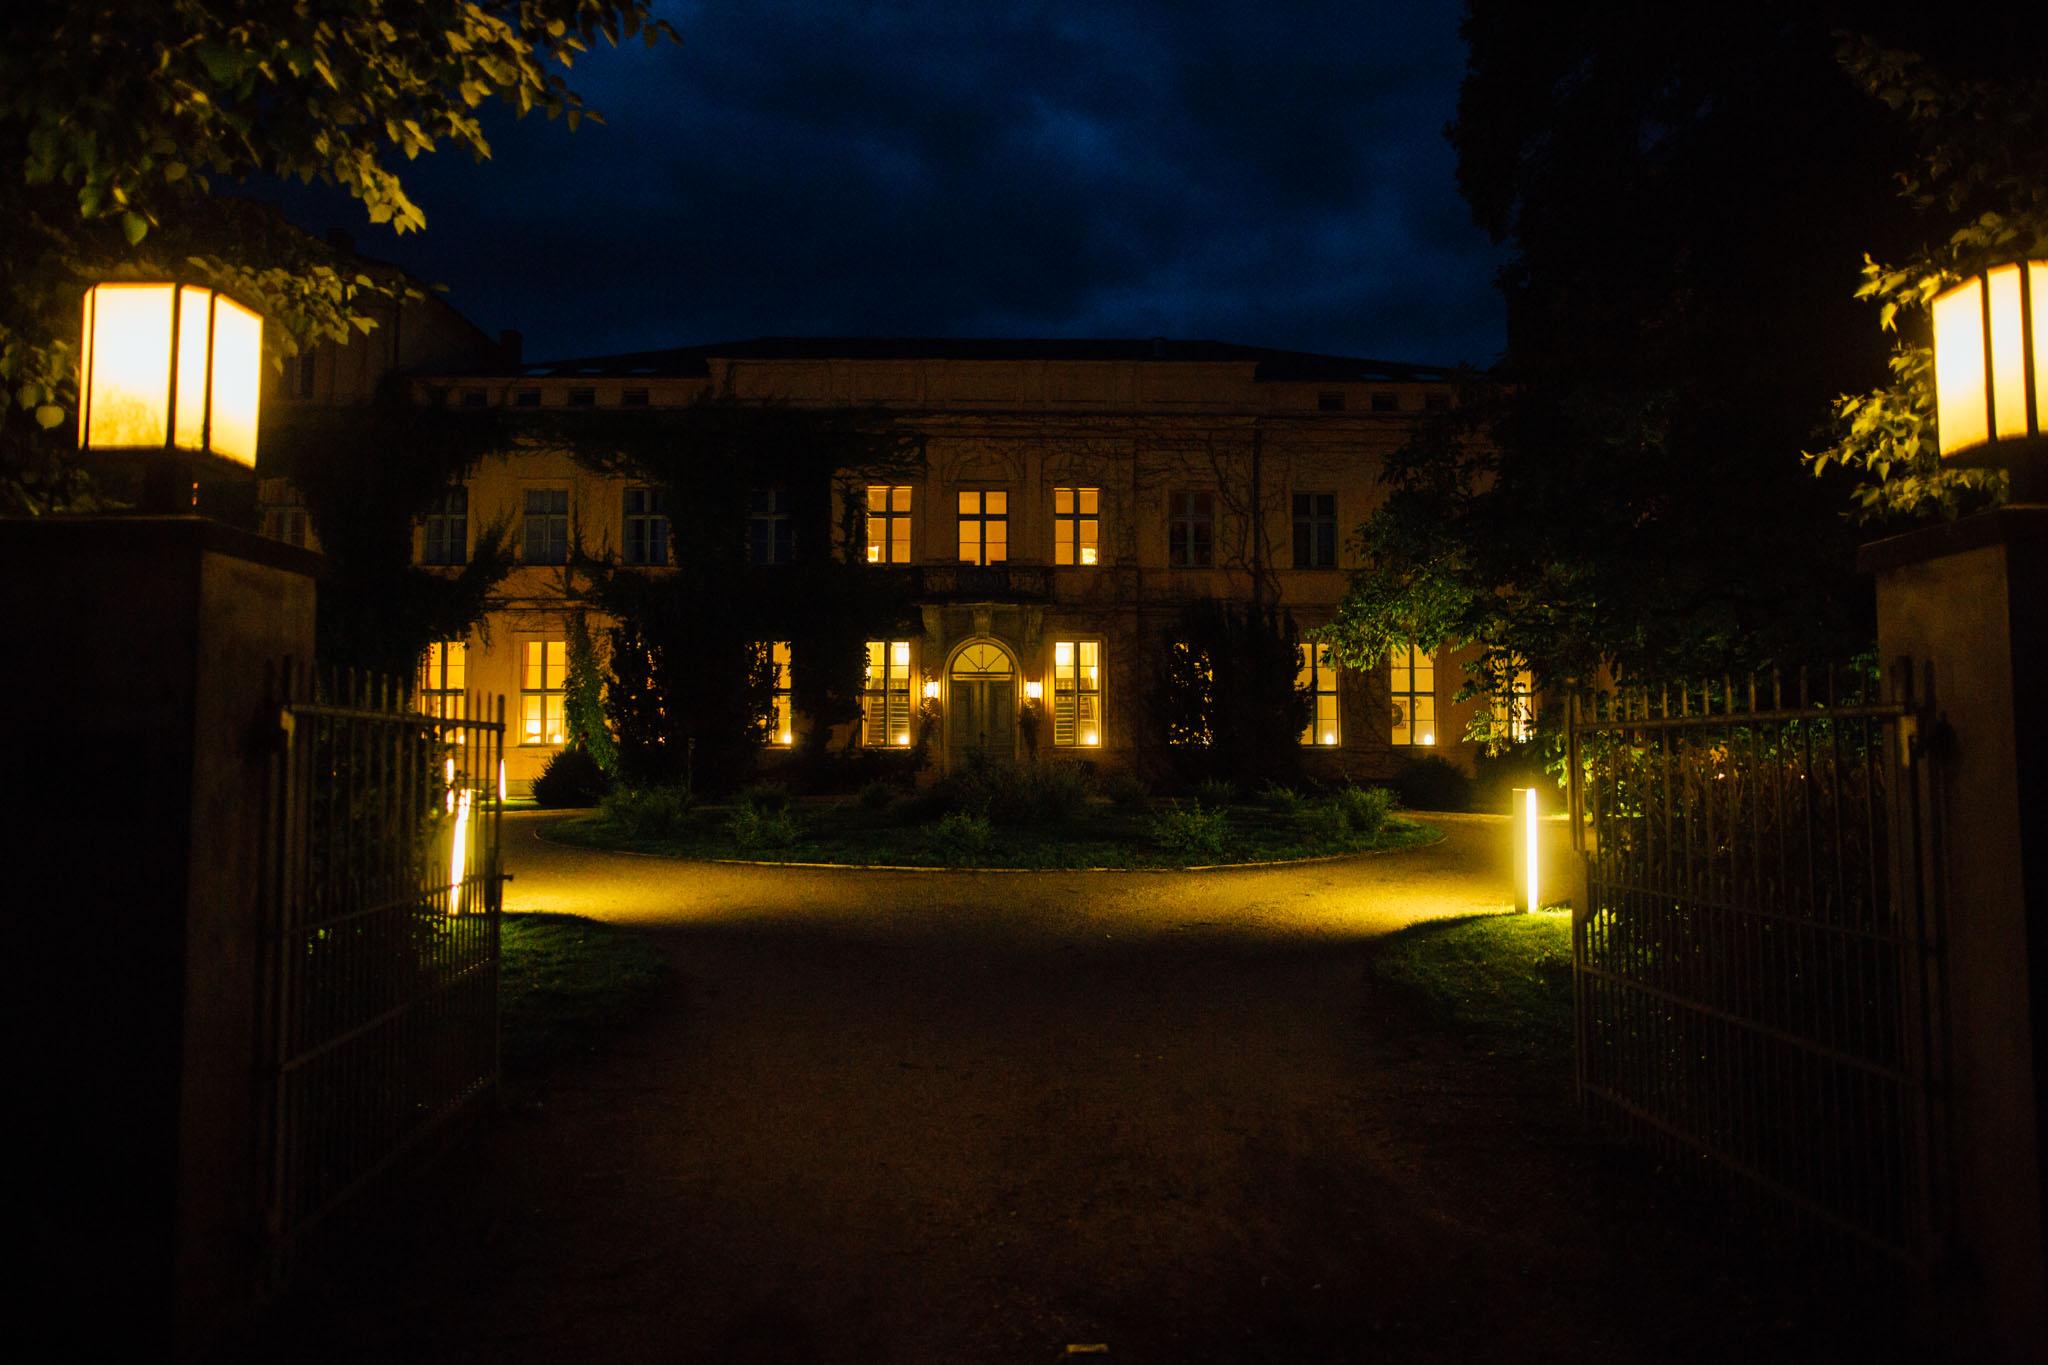 schloss-brandenburg-kremmen-nacht